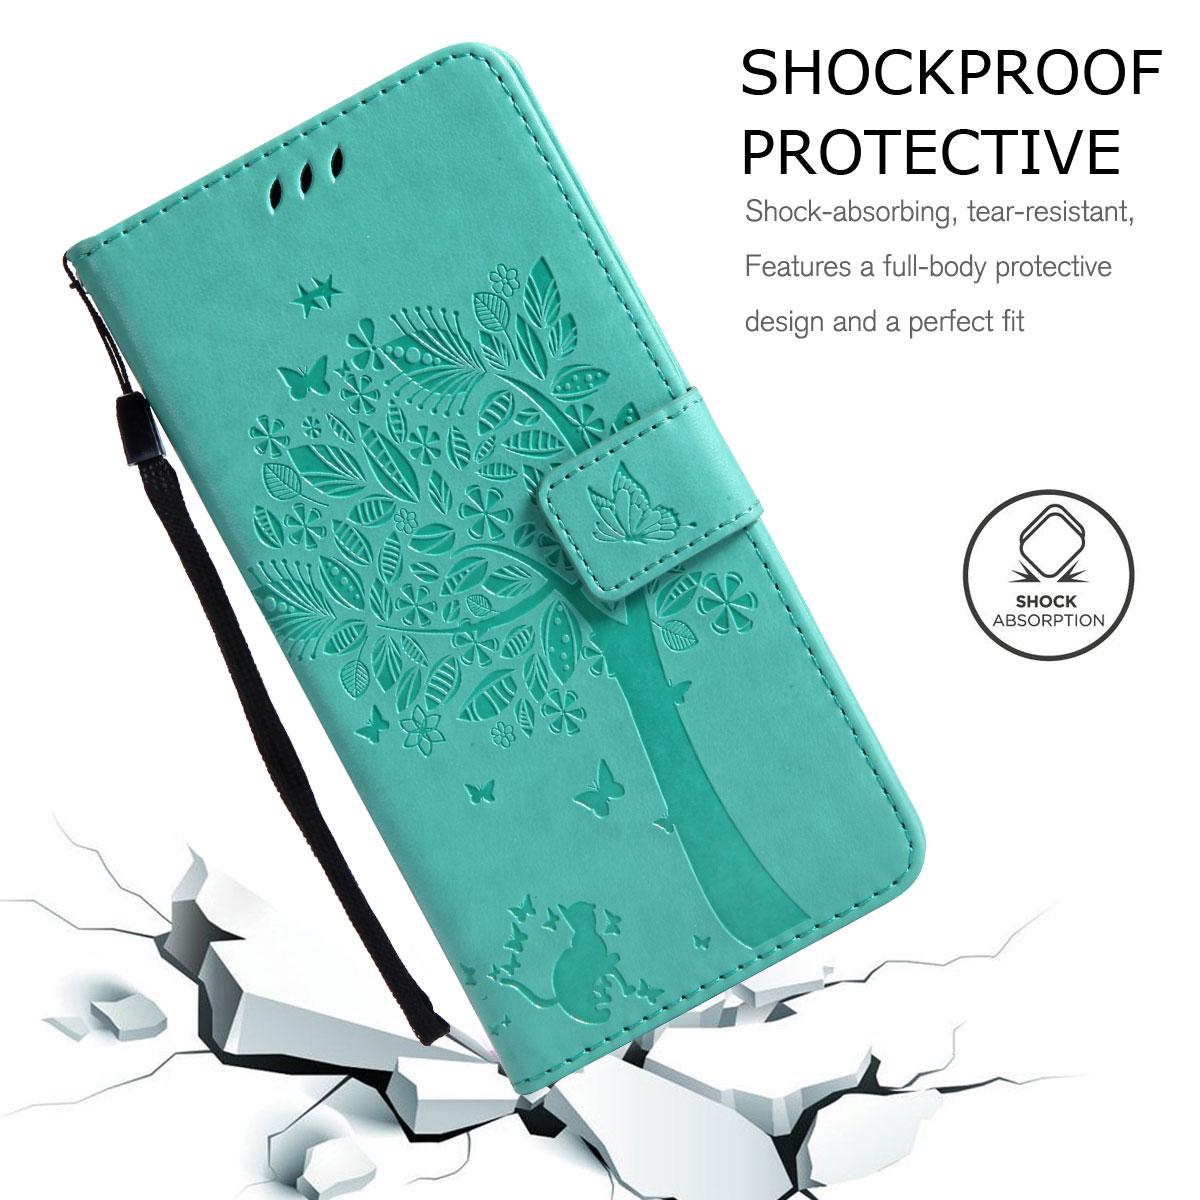 Magnetic-Leather-Credit-Card-Holder-Flip-Case-Cover-For-Google-Pixel-2-2-XL thumbnail 88